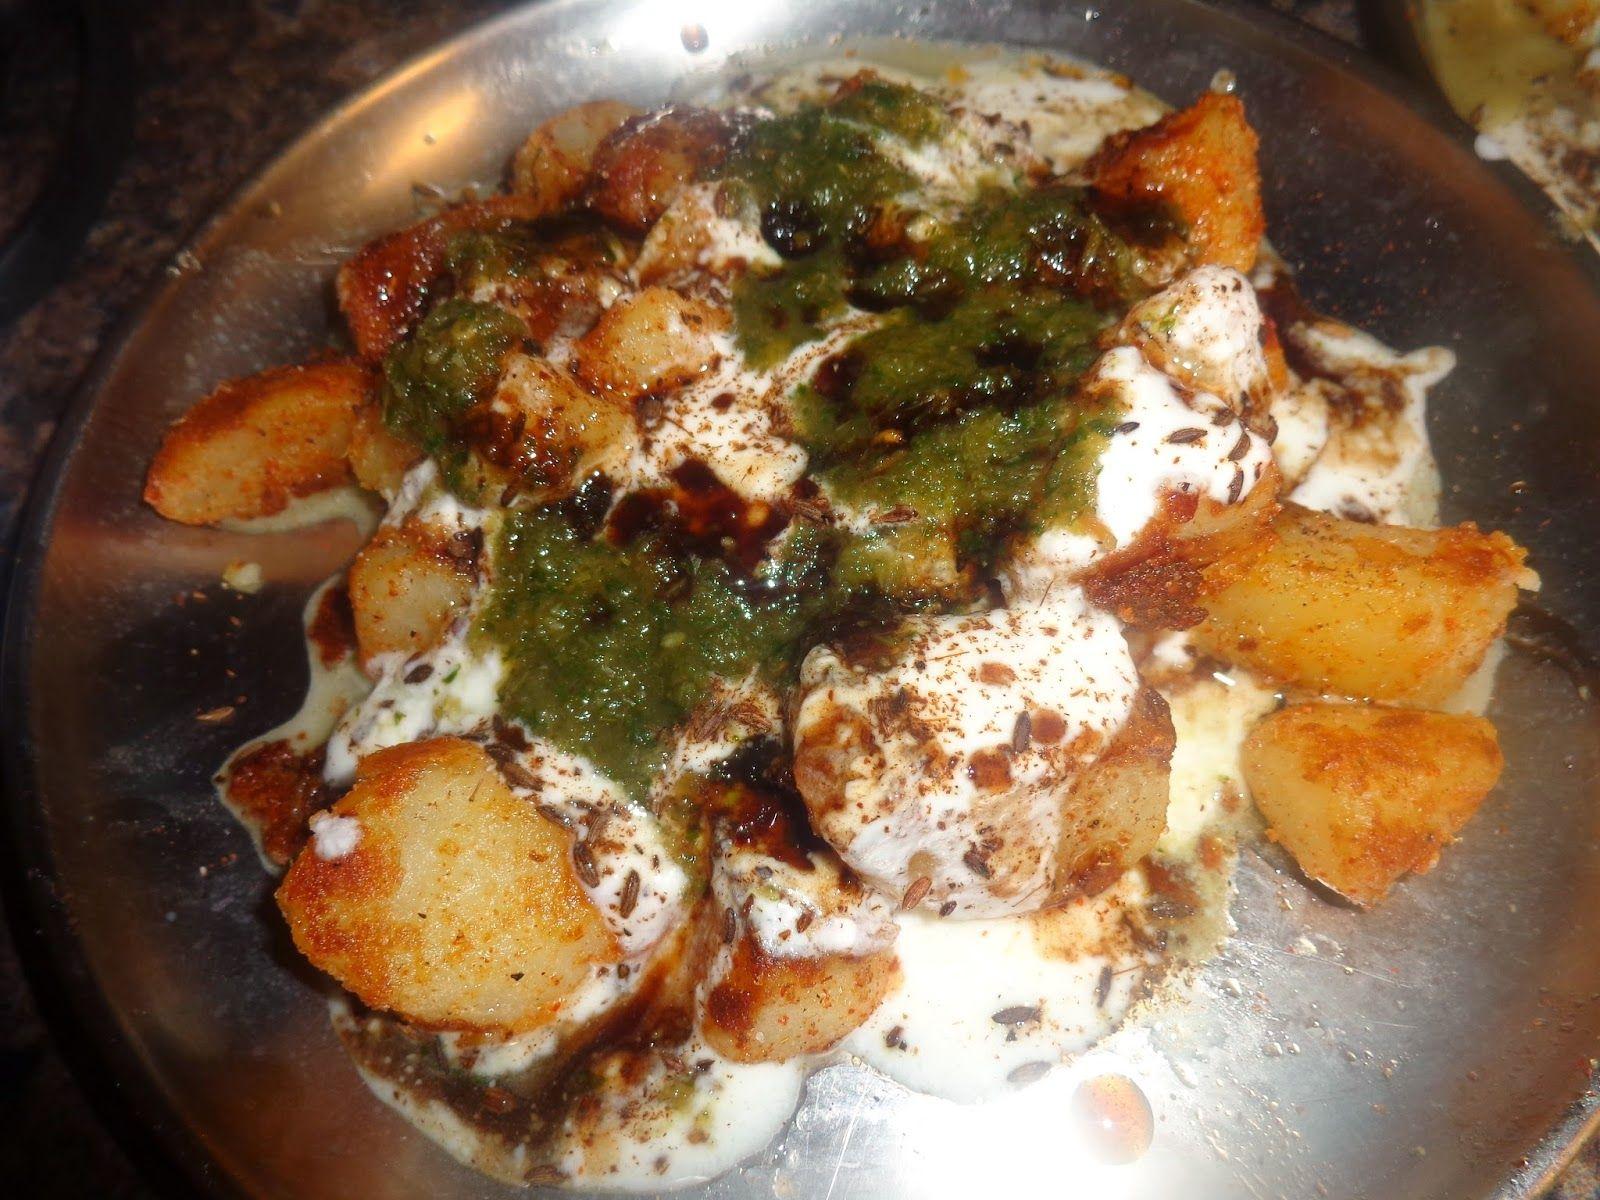 Aloo dahi chaat recipe indian street food indian food recipes aloo dahi chaat recipe indian street food forumfinder Images